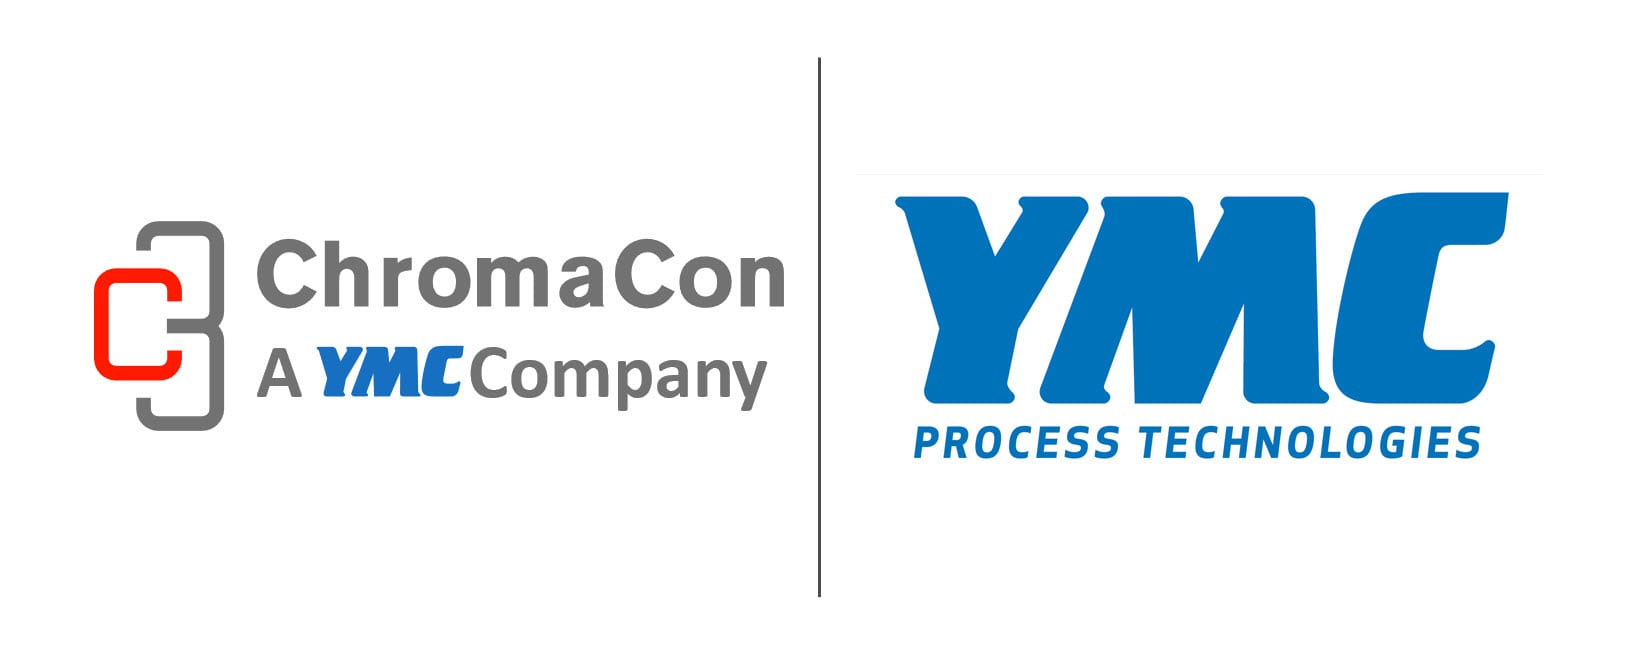 ChromaCon YPT Logo Combined